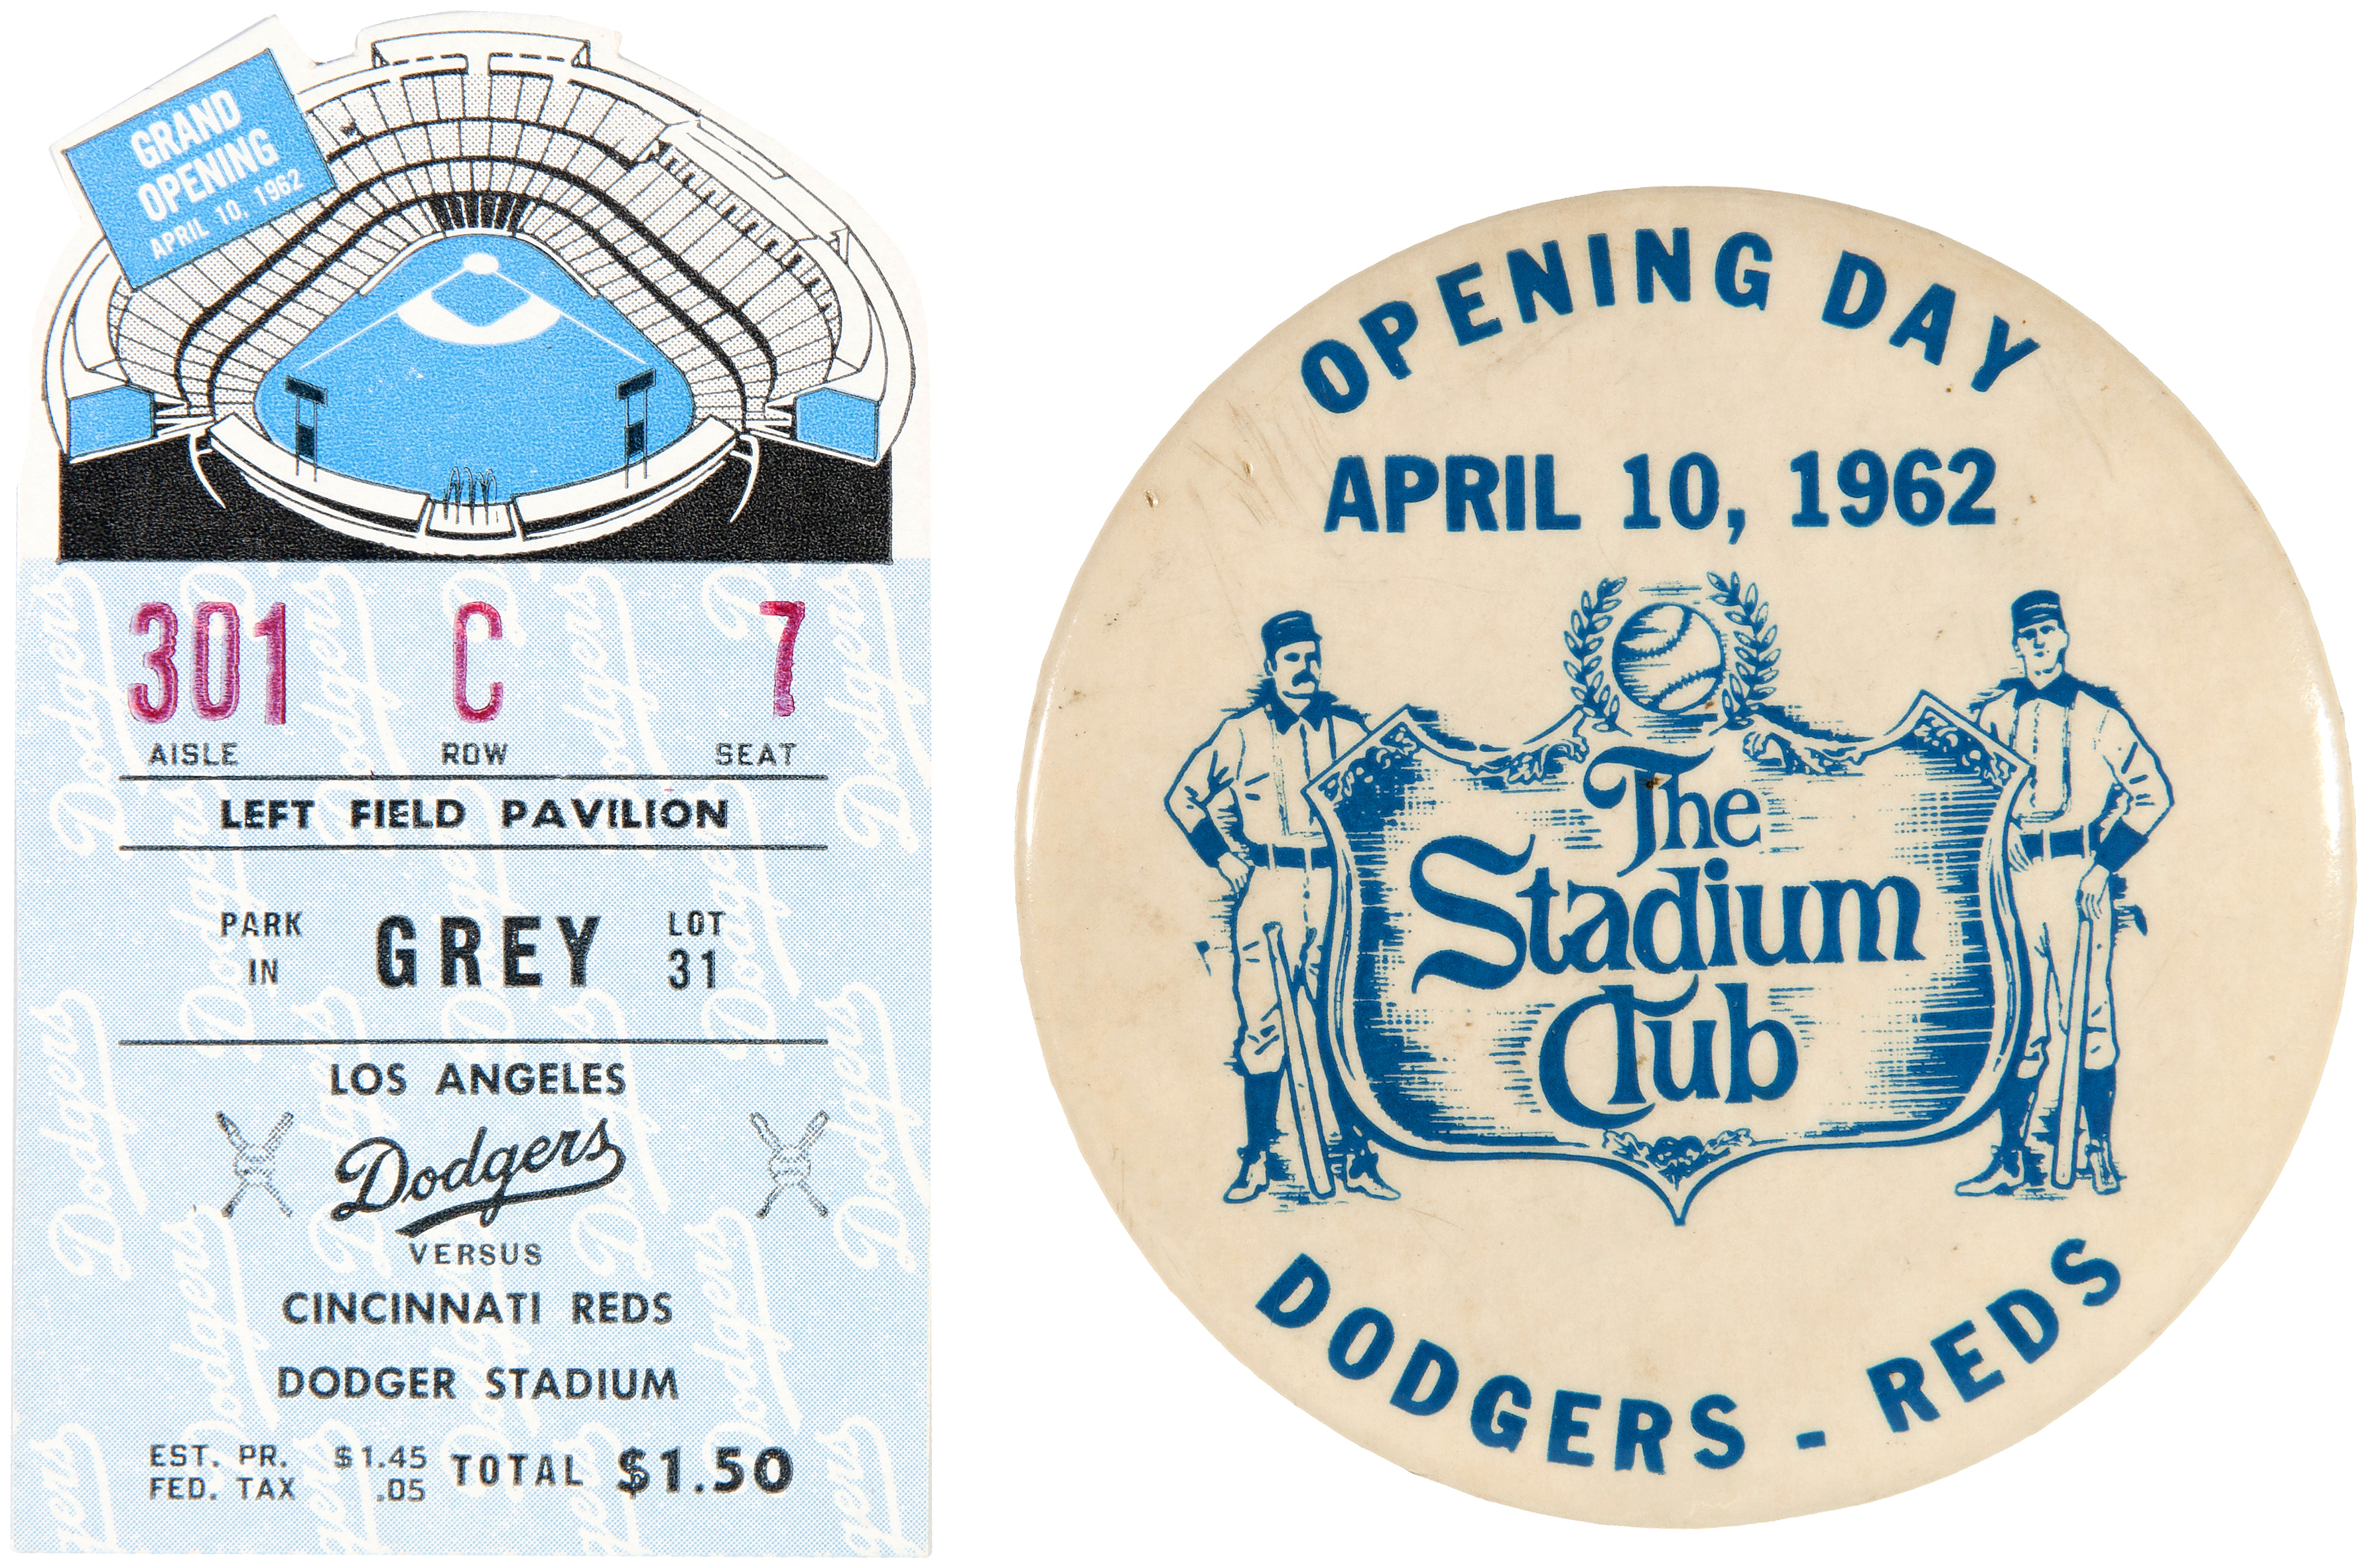 Hake S Dodger Stadium 1962 Opening Day Lot